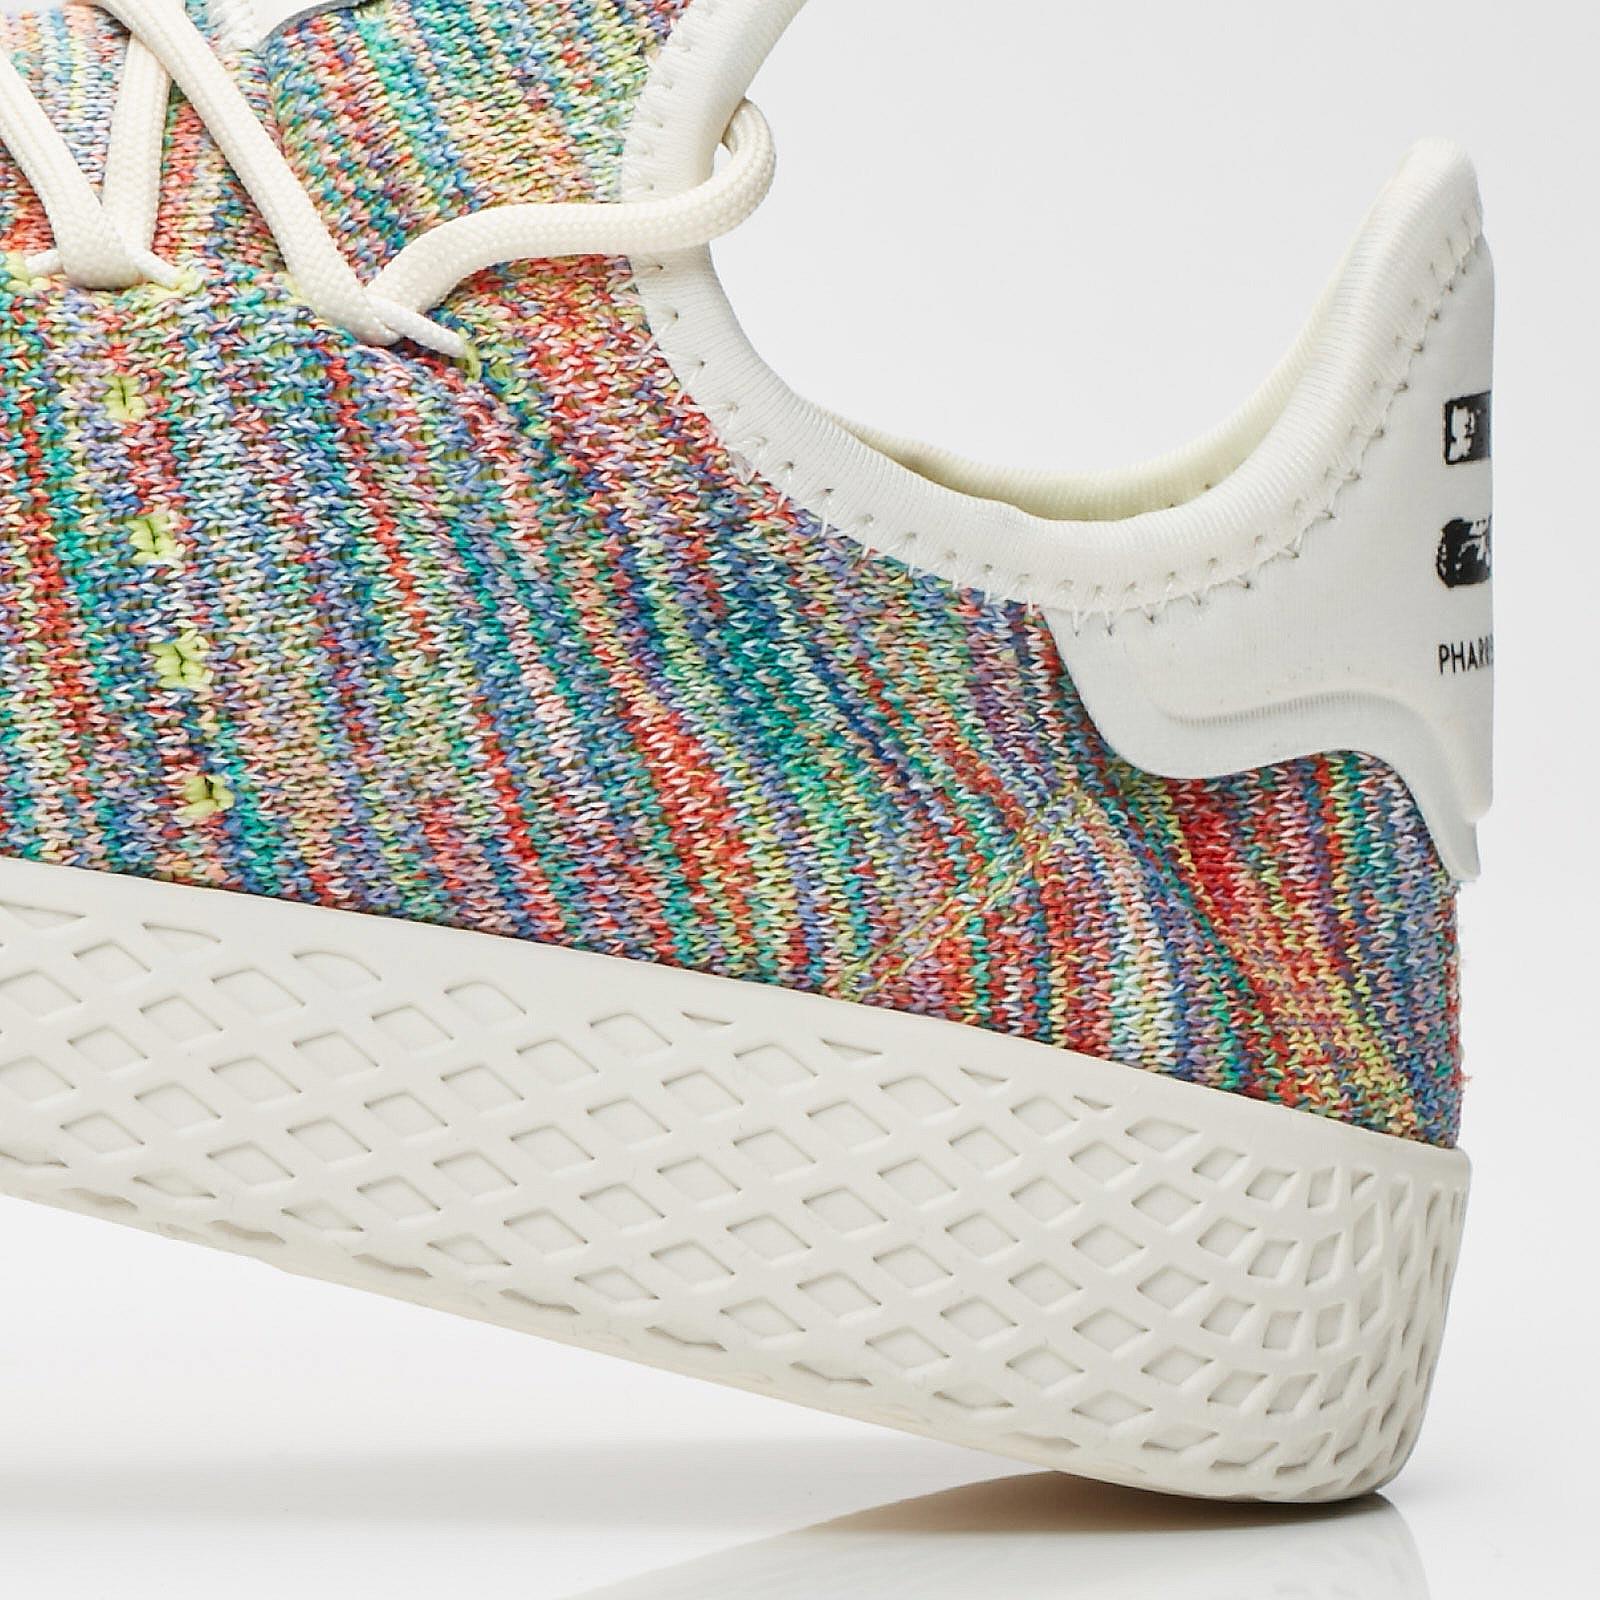 adidas PW Tennis HU PK Cq2631 Sneakersnstuff I Sneakers